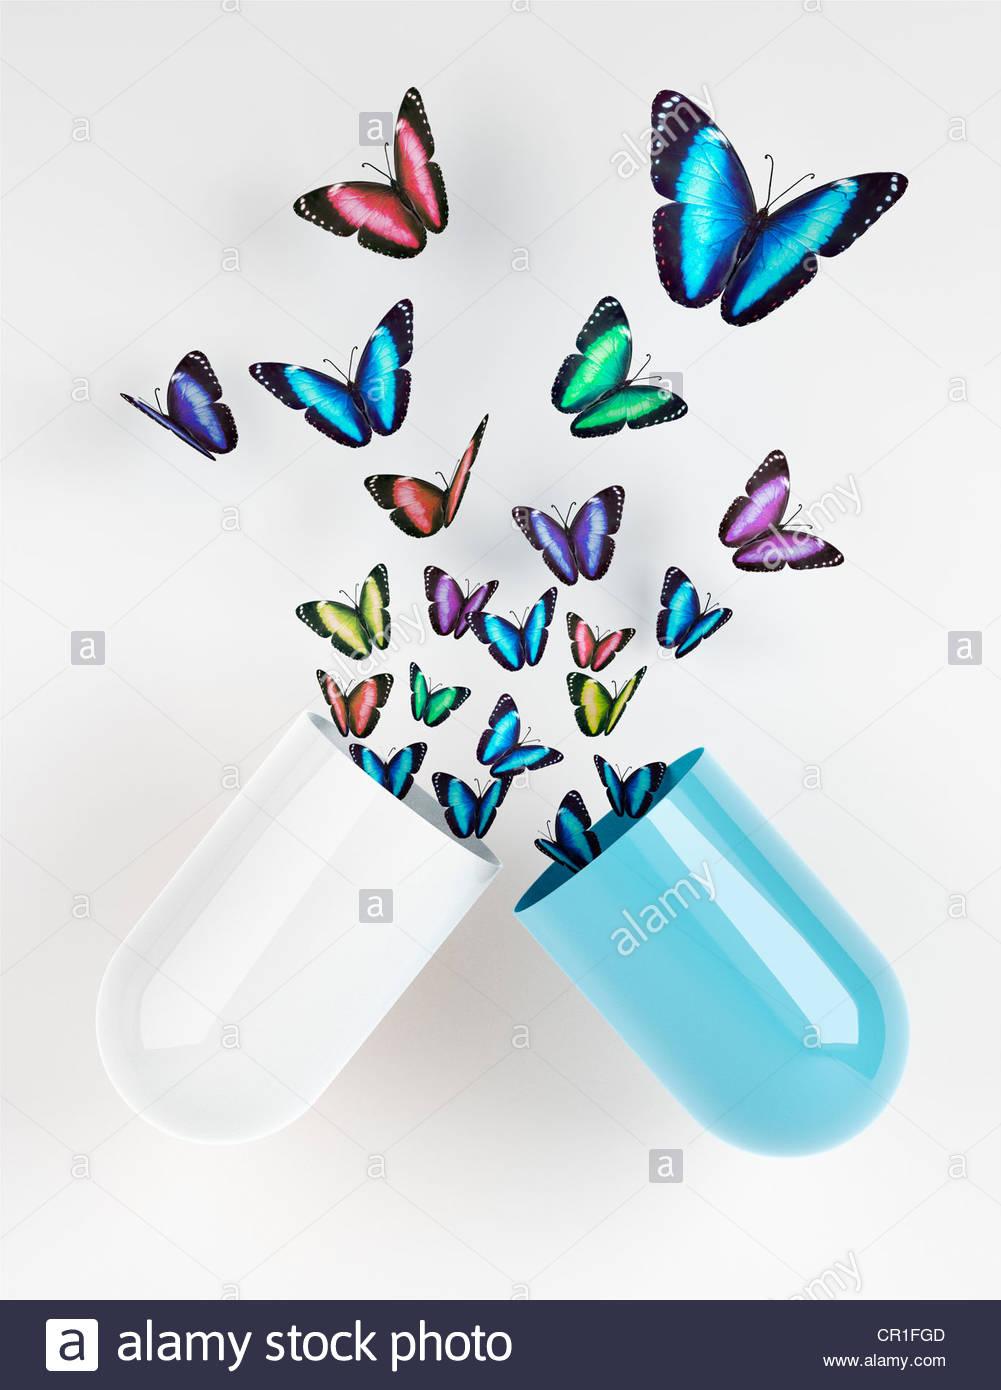 Schmetterlinge aus Kapsel Stockfoto